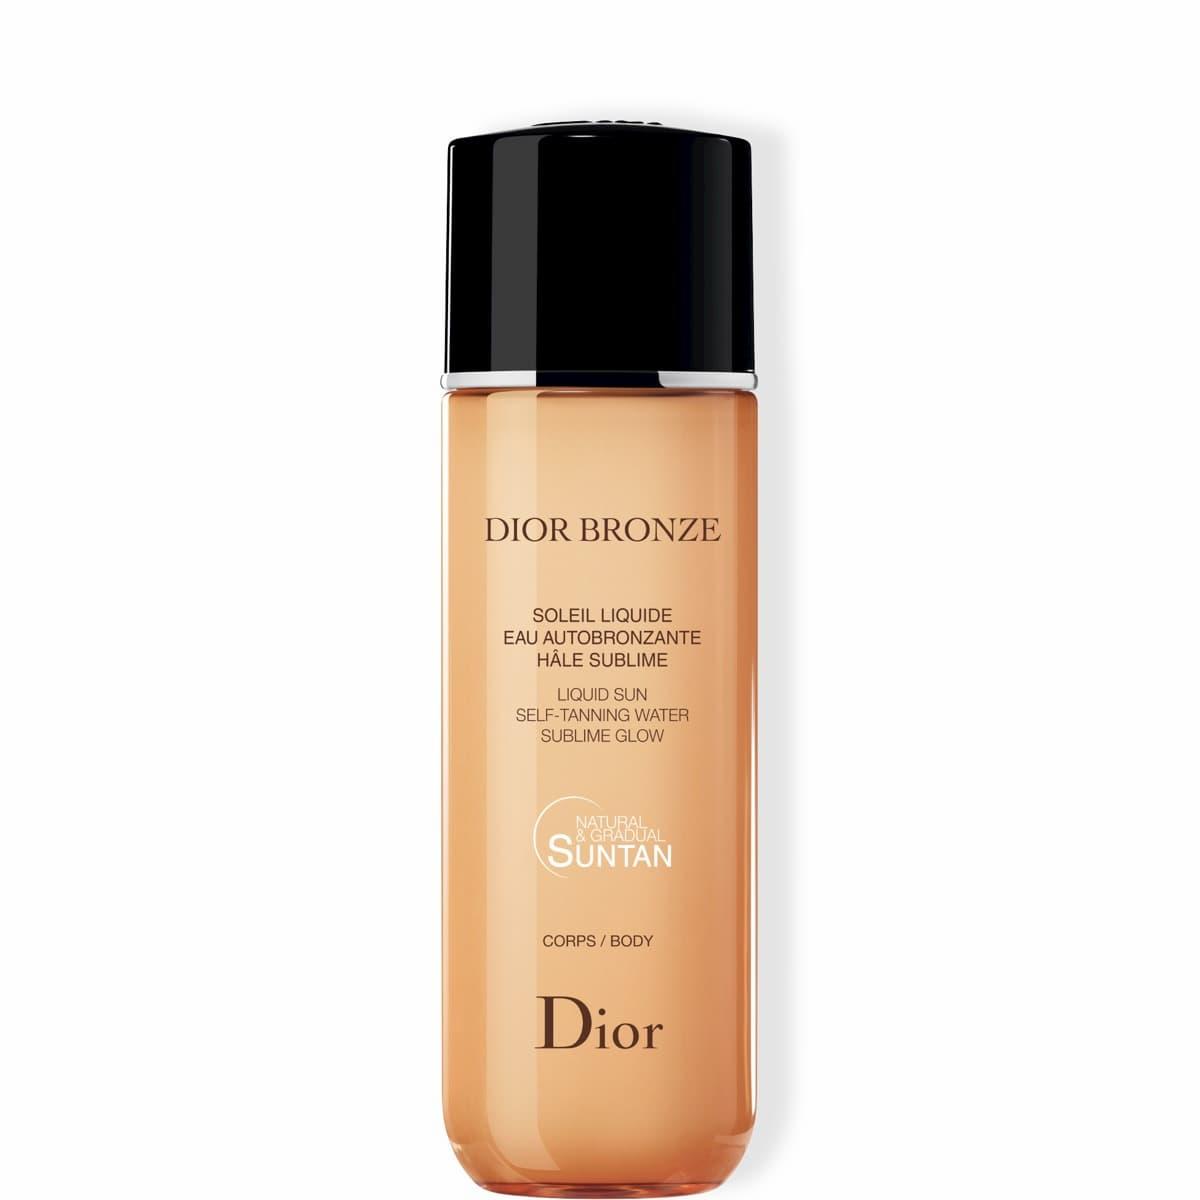 Dior Bronze Soleil liquide eau autobronzante